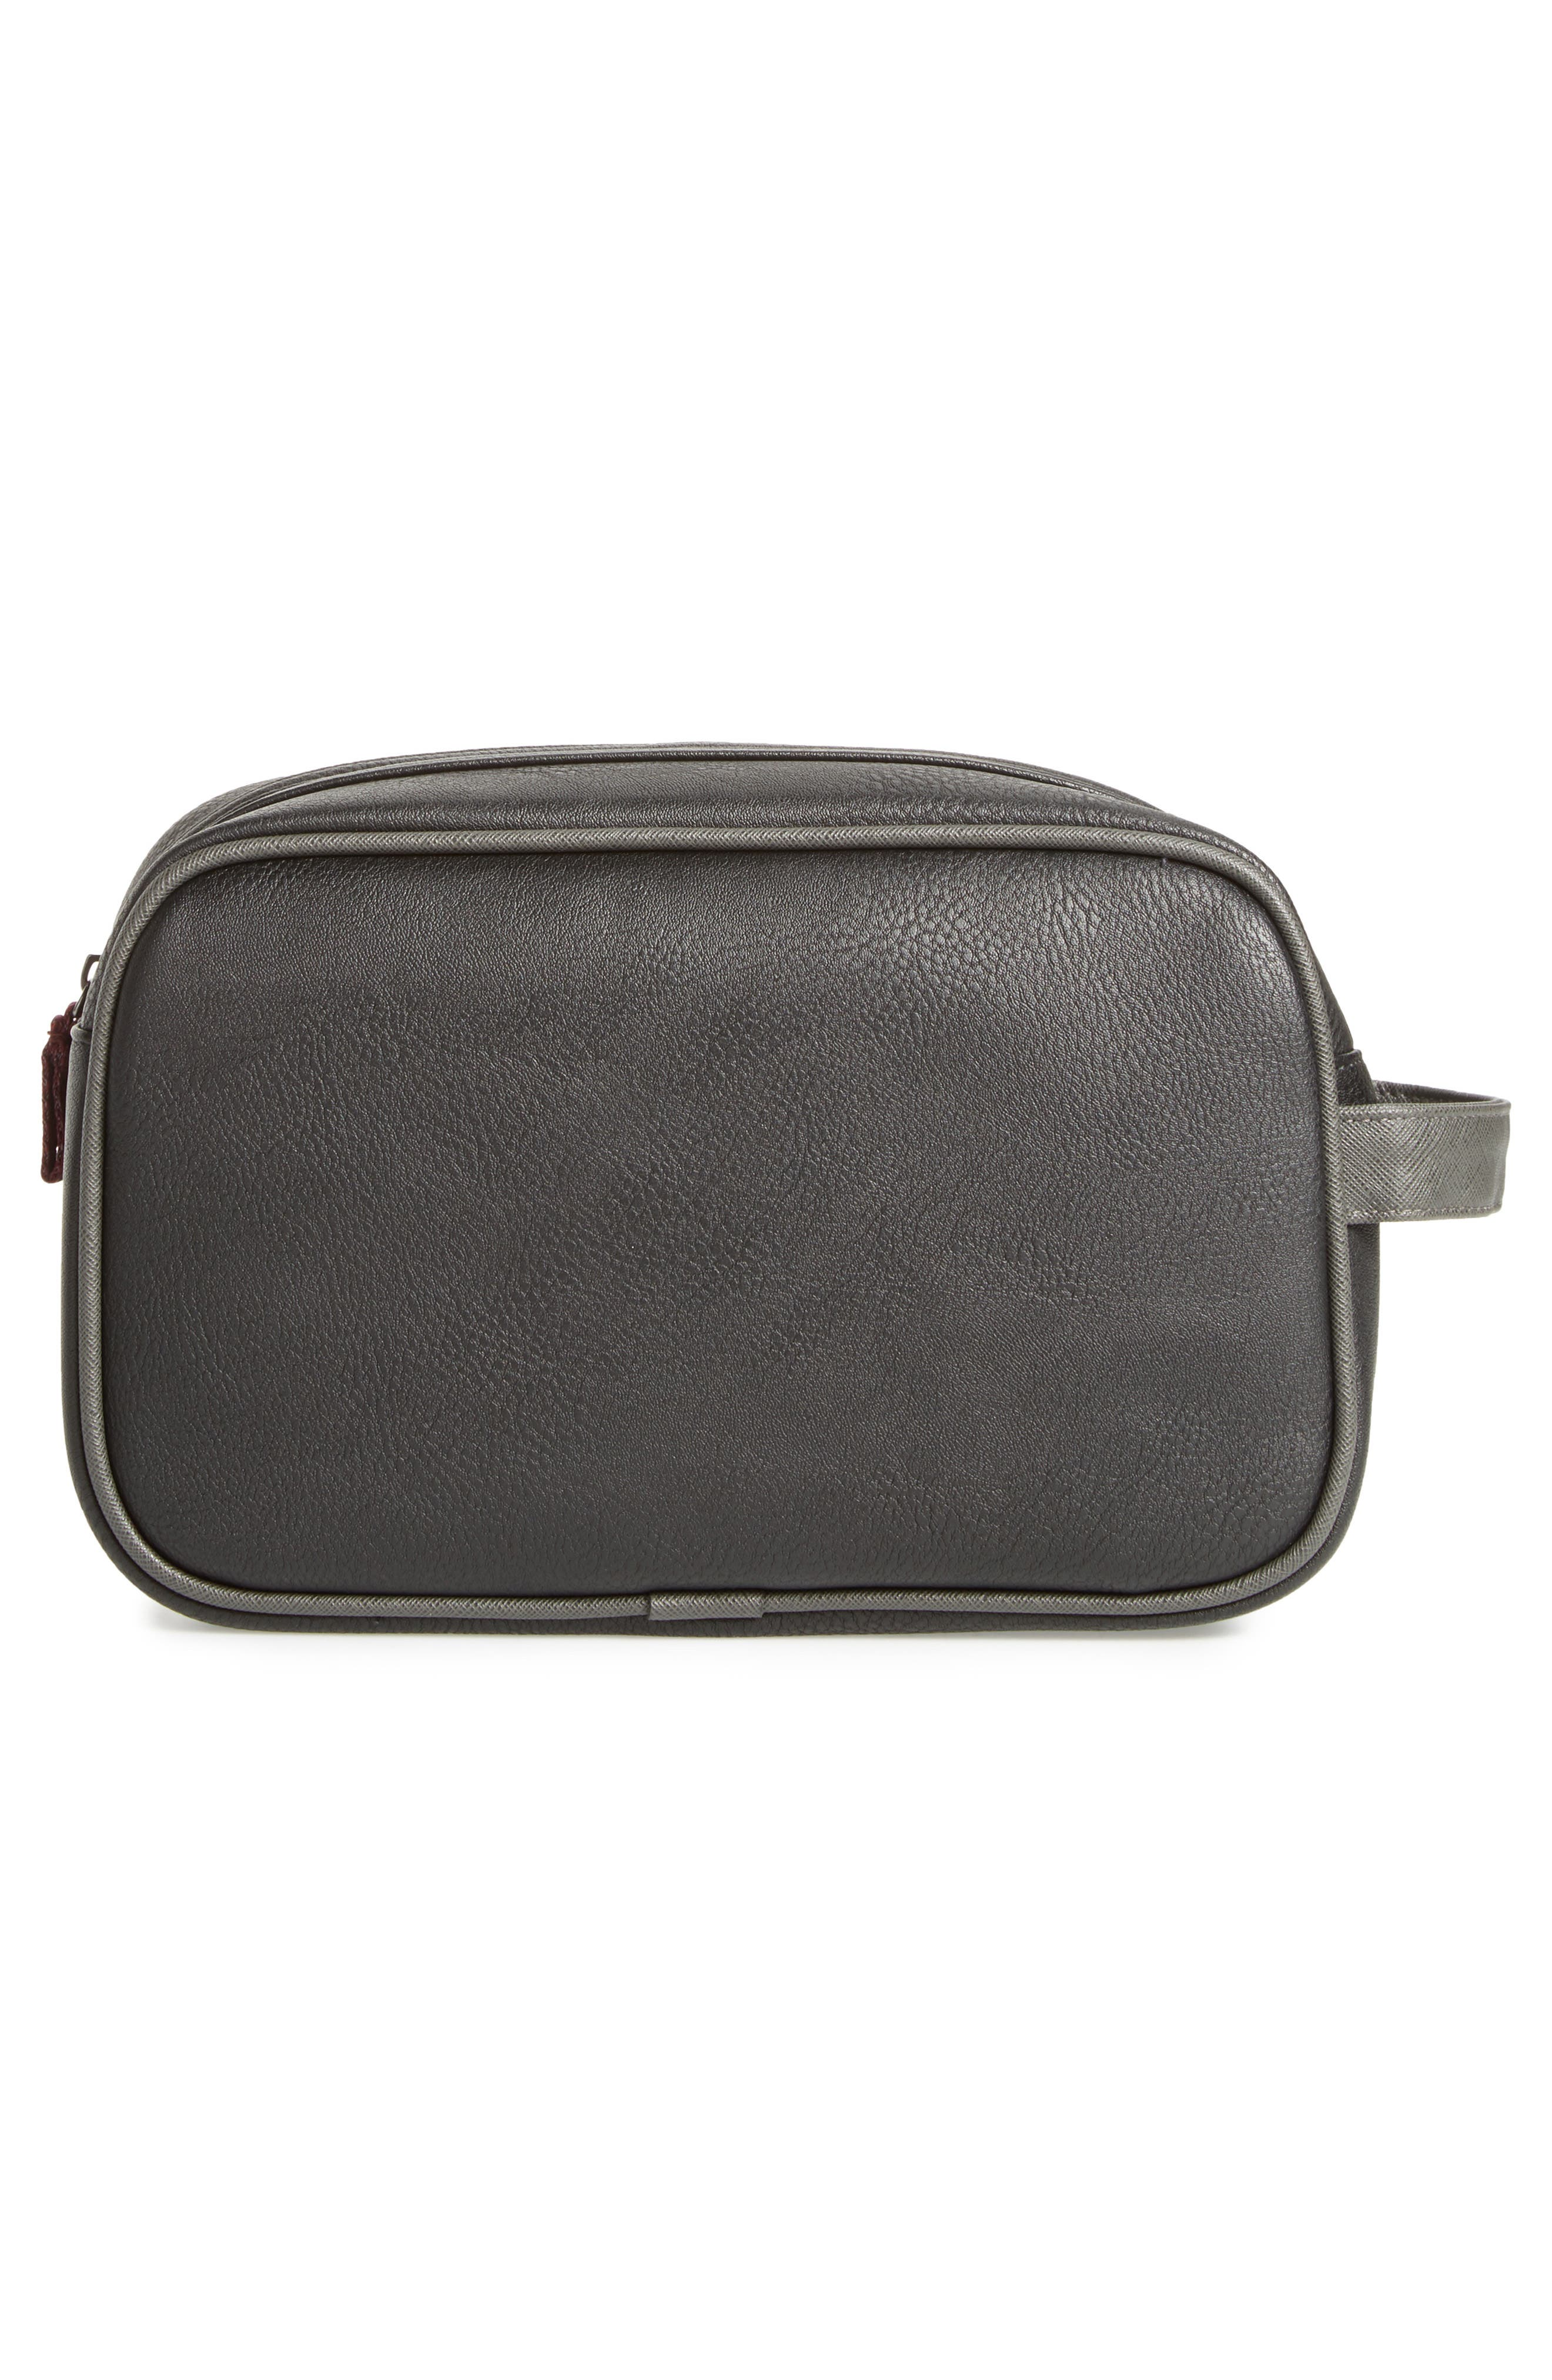 Pidgy Faux Leather Travel Kit,                             Alternate thumbnail 2, color,                             001